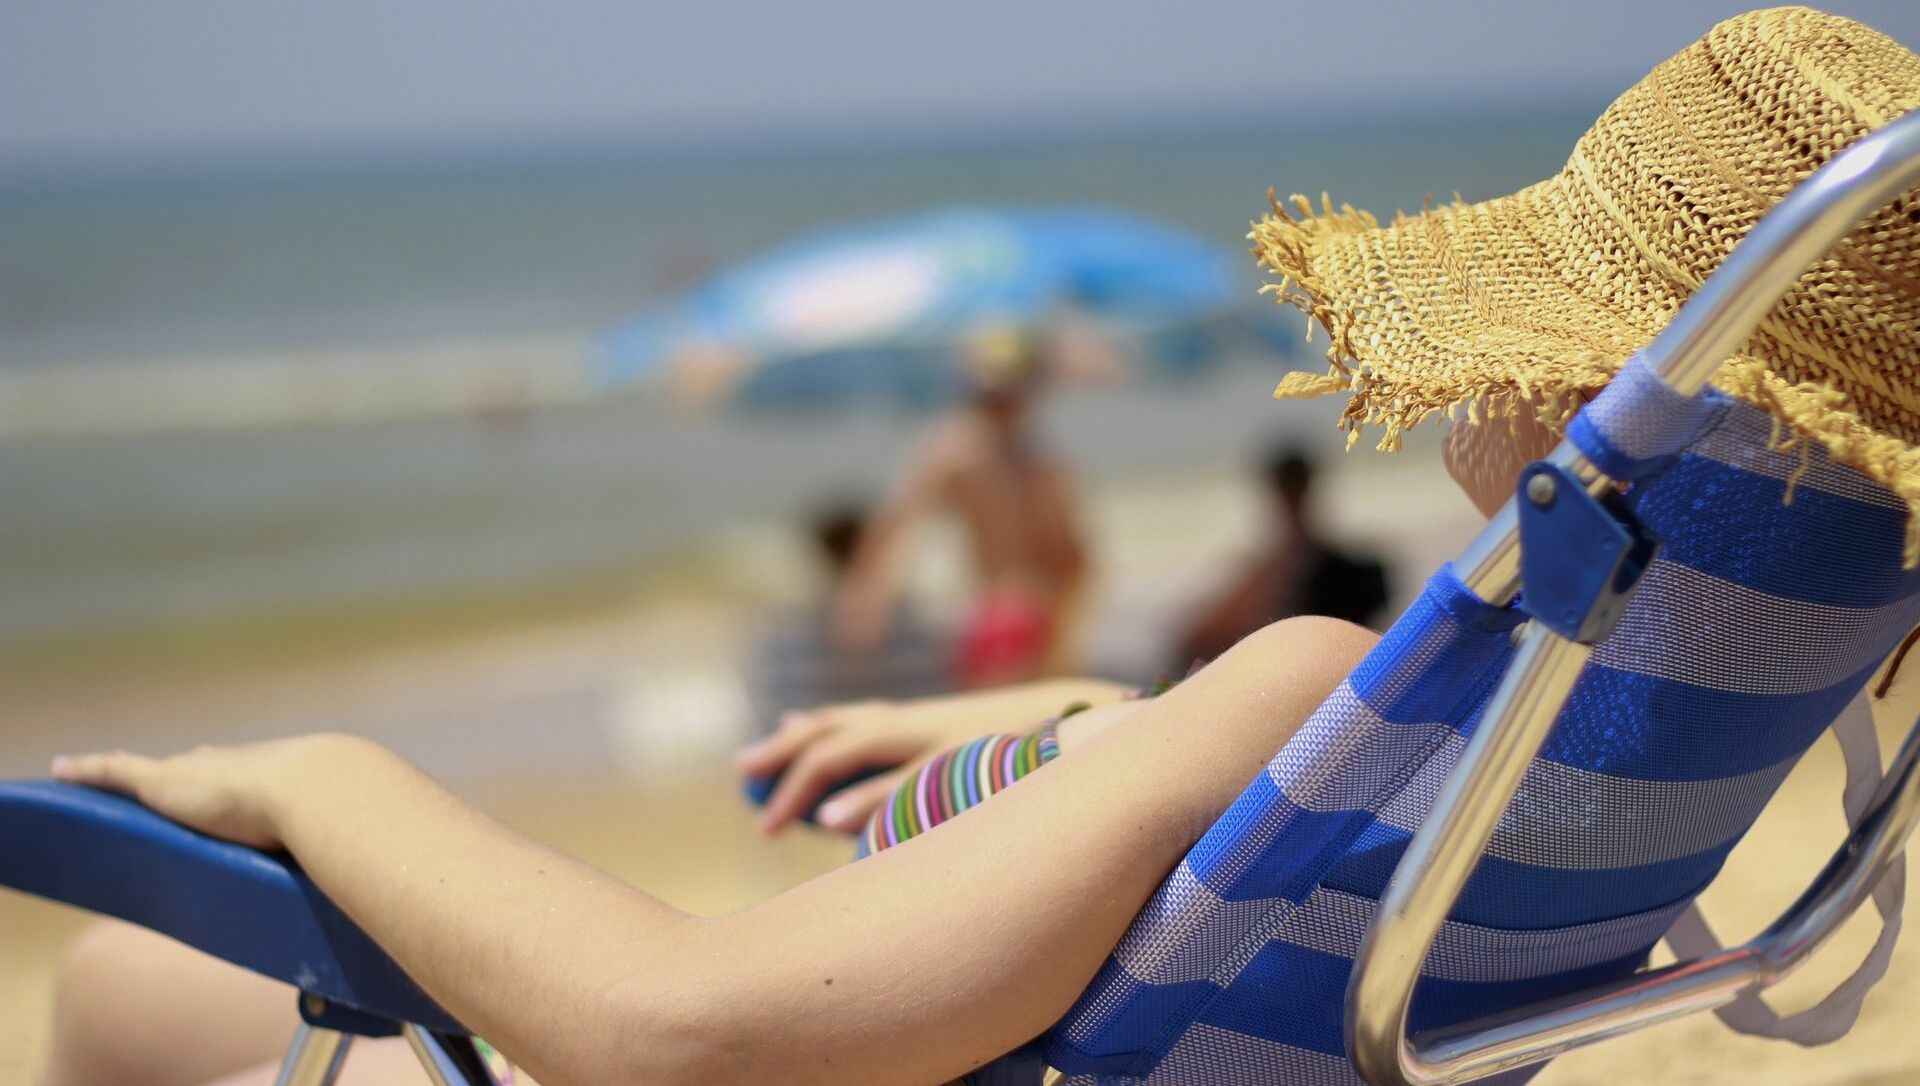 Woman relaxes on the beach in Matalascañas, Spain - Sputnik International, 1920, 04.08.2021